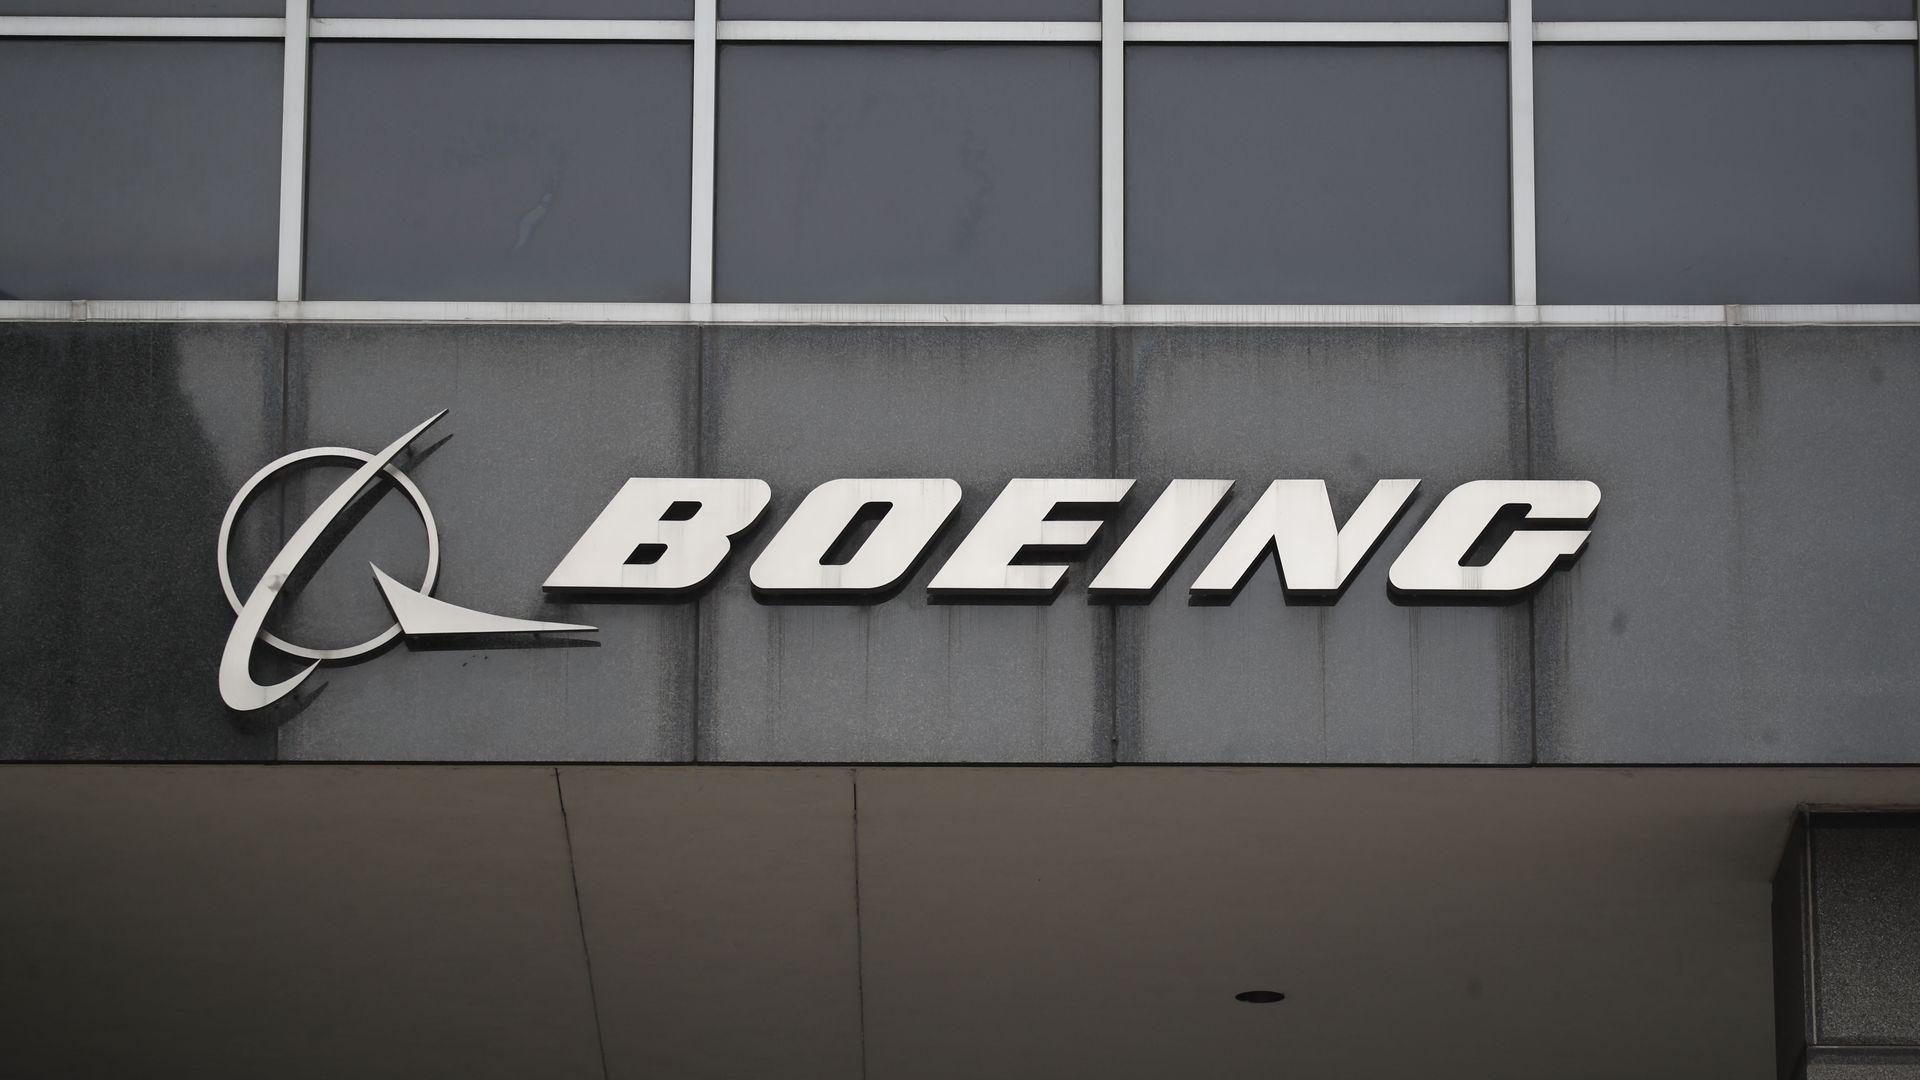 Boeing's logo.